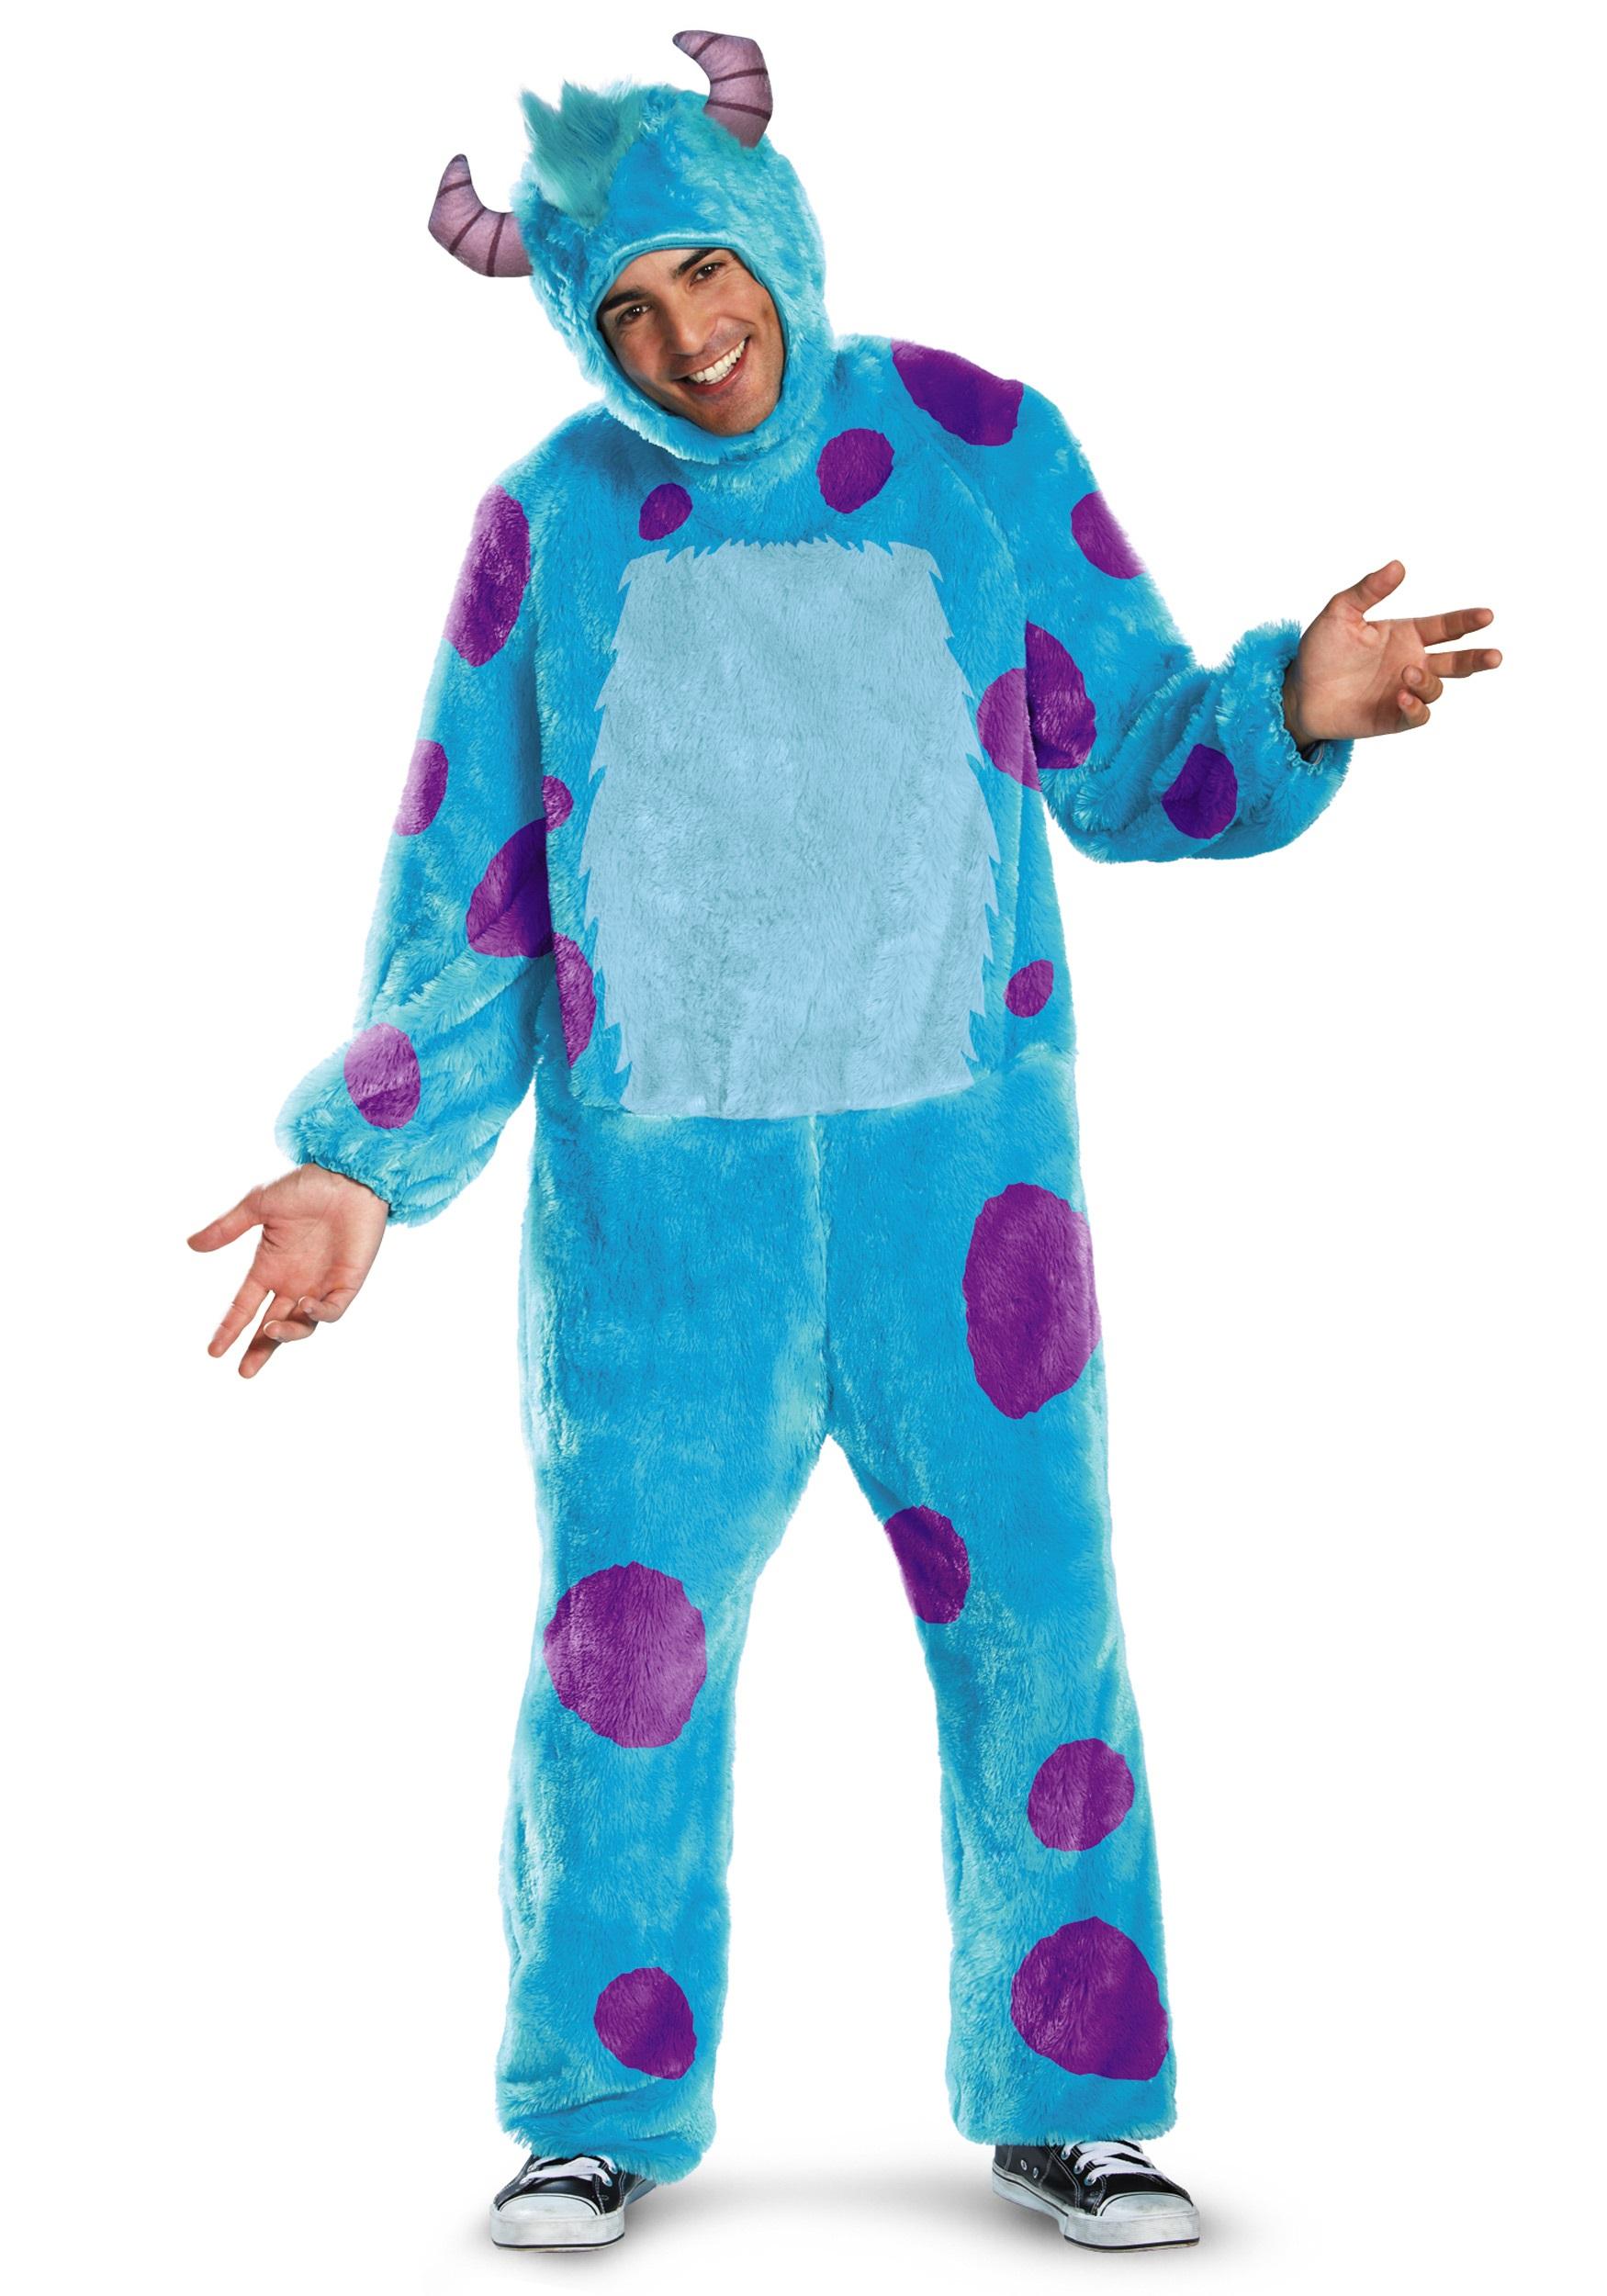 81368f0d2b2 Sulley Costumes | CostumesFC.com